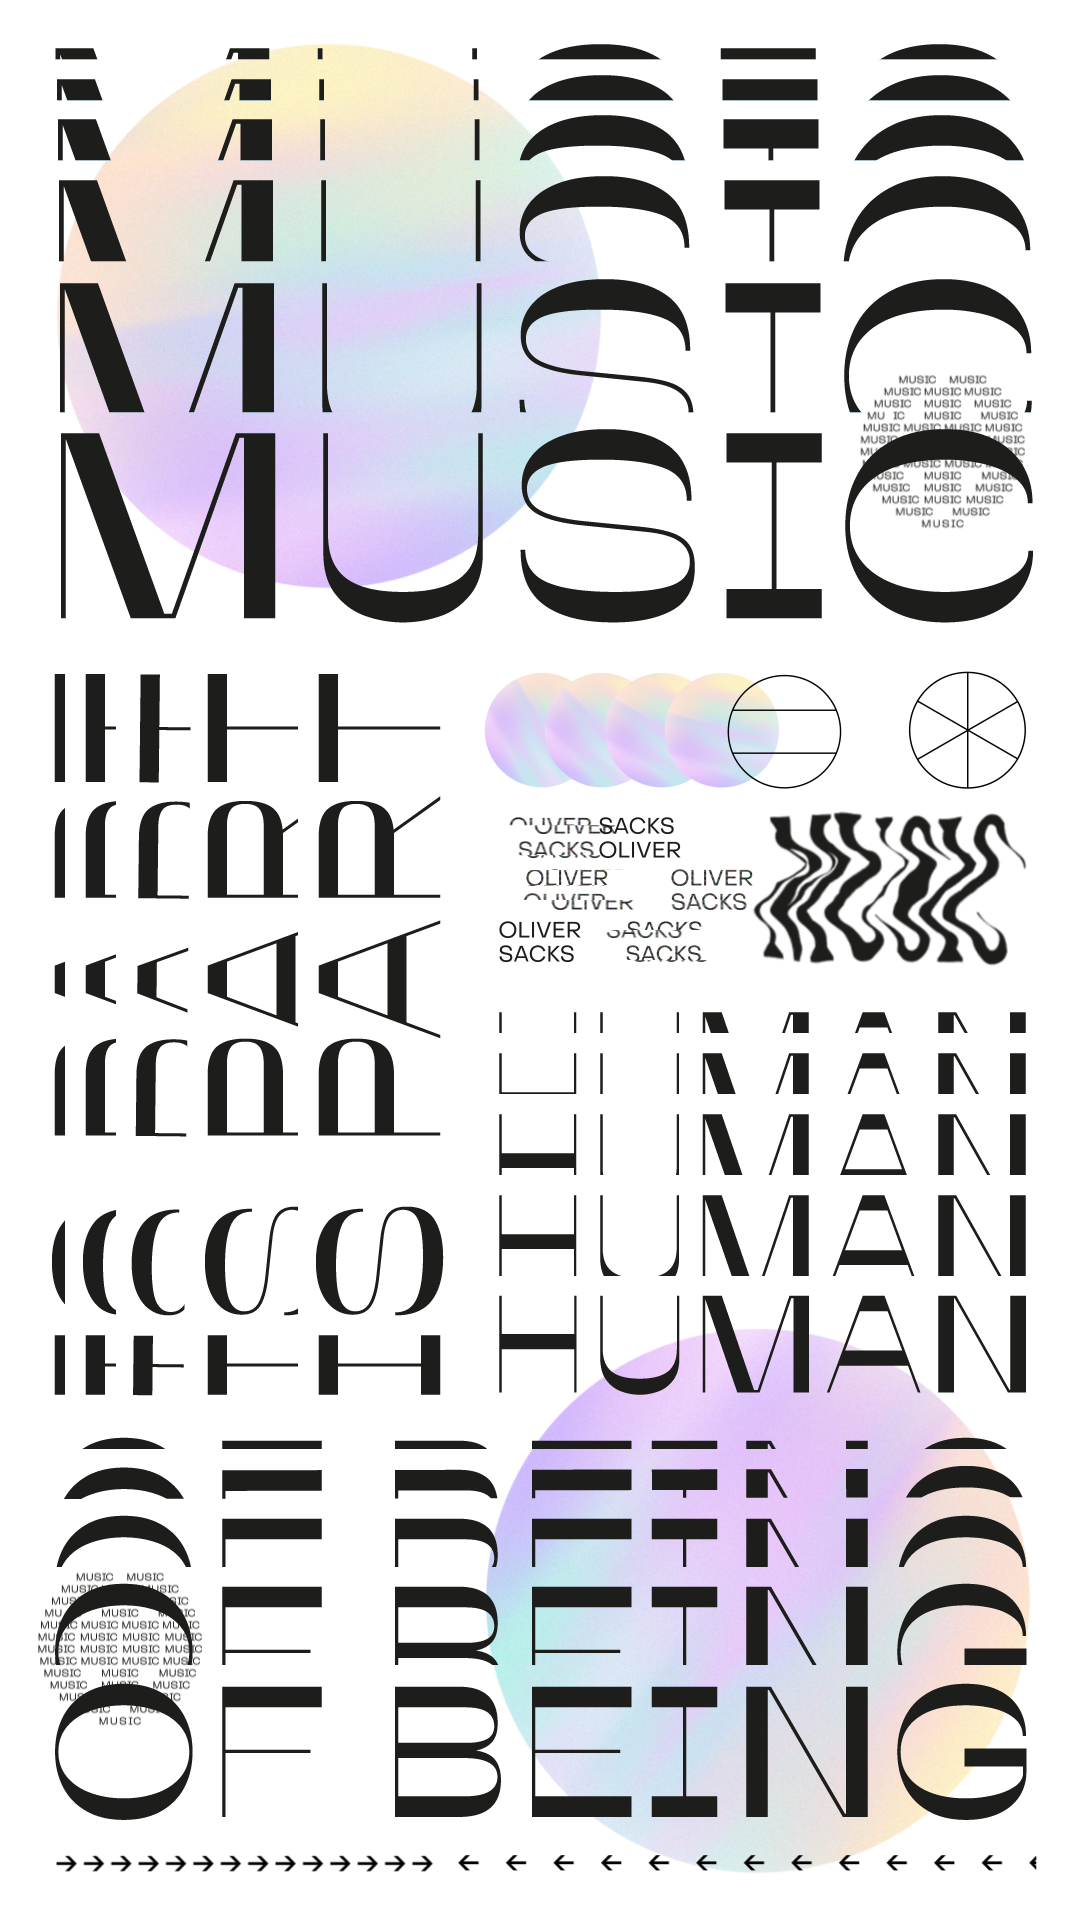 FormatWars_Musicophilia_2.png